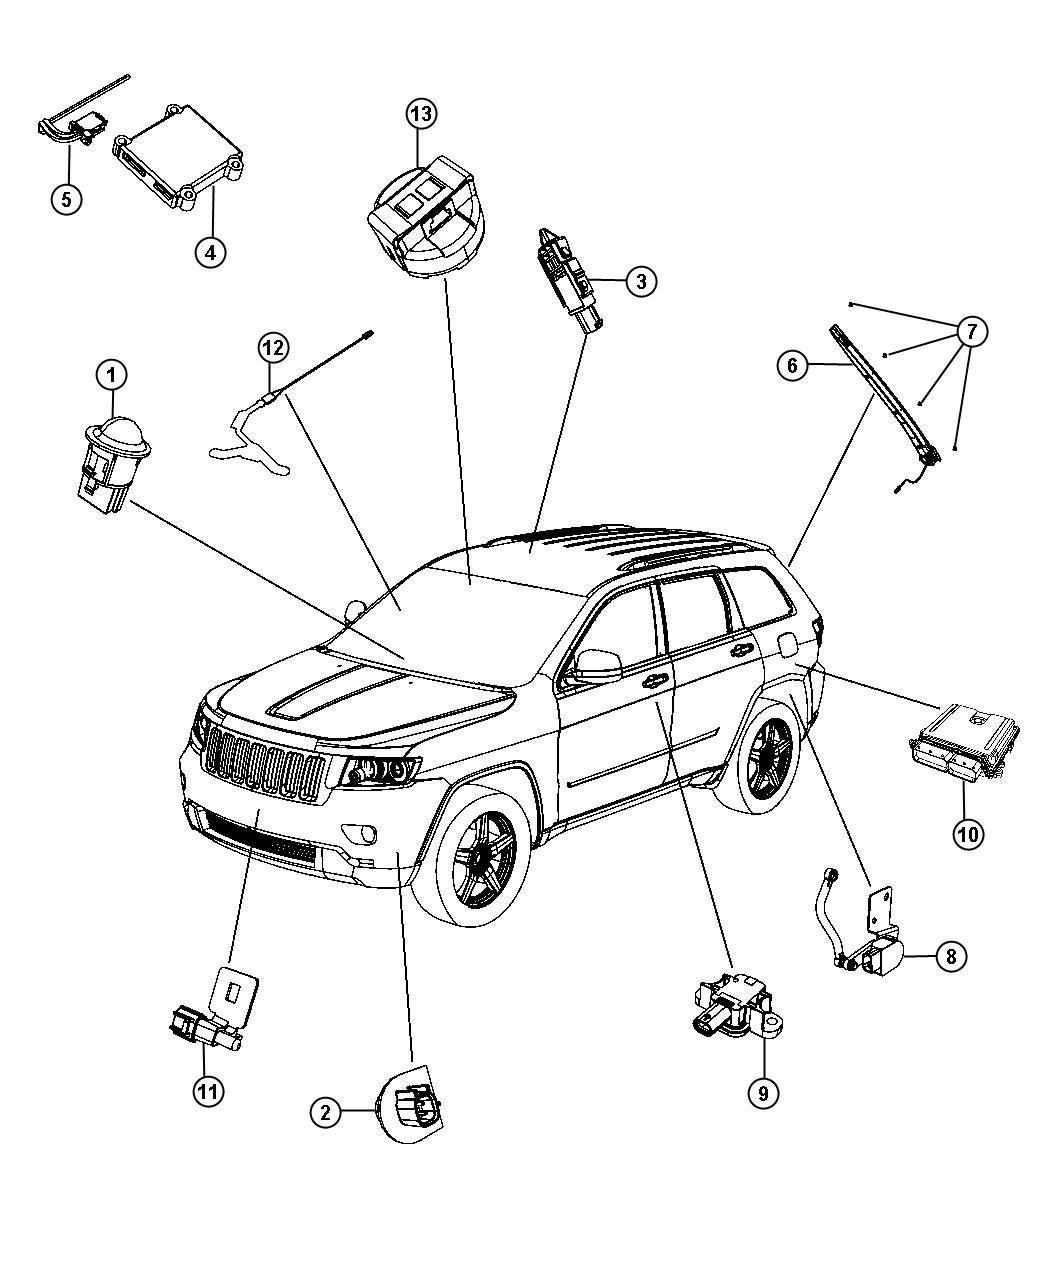 2012 Jeep Grand Cherokee Clip. Sensor. Pinch sensor holes